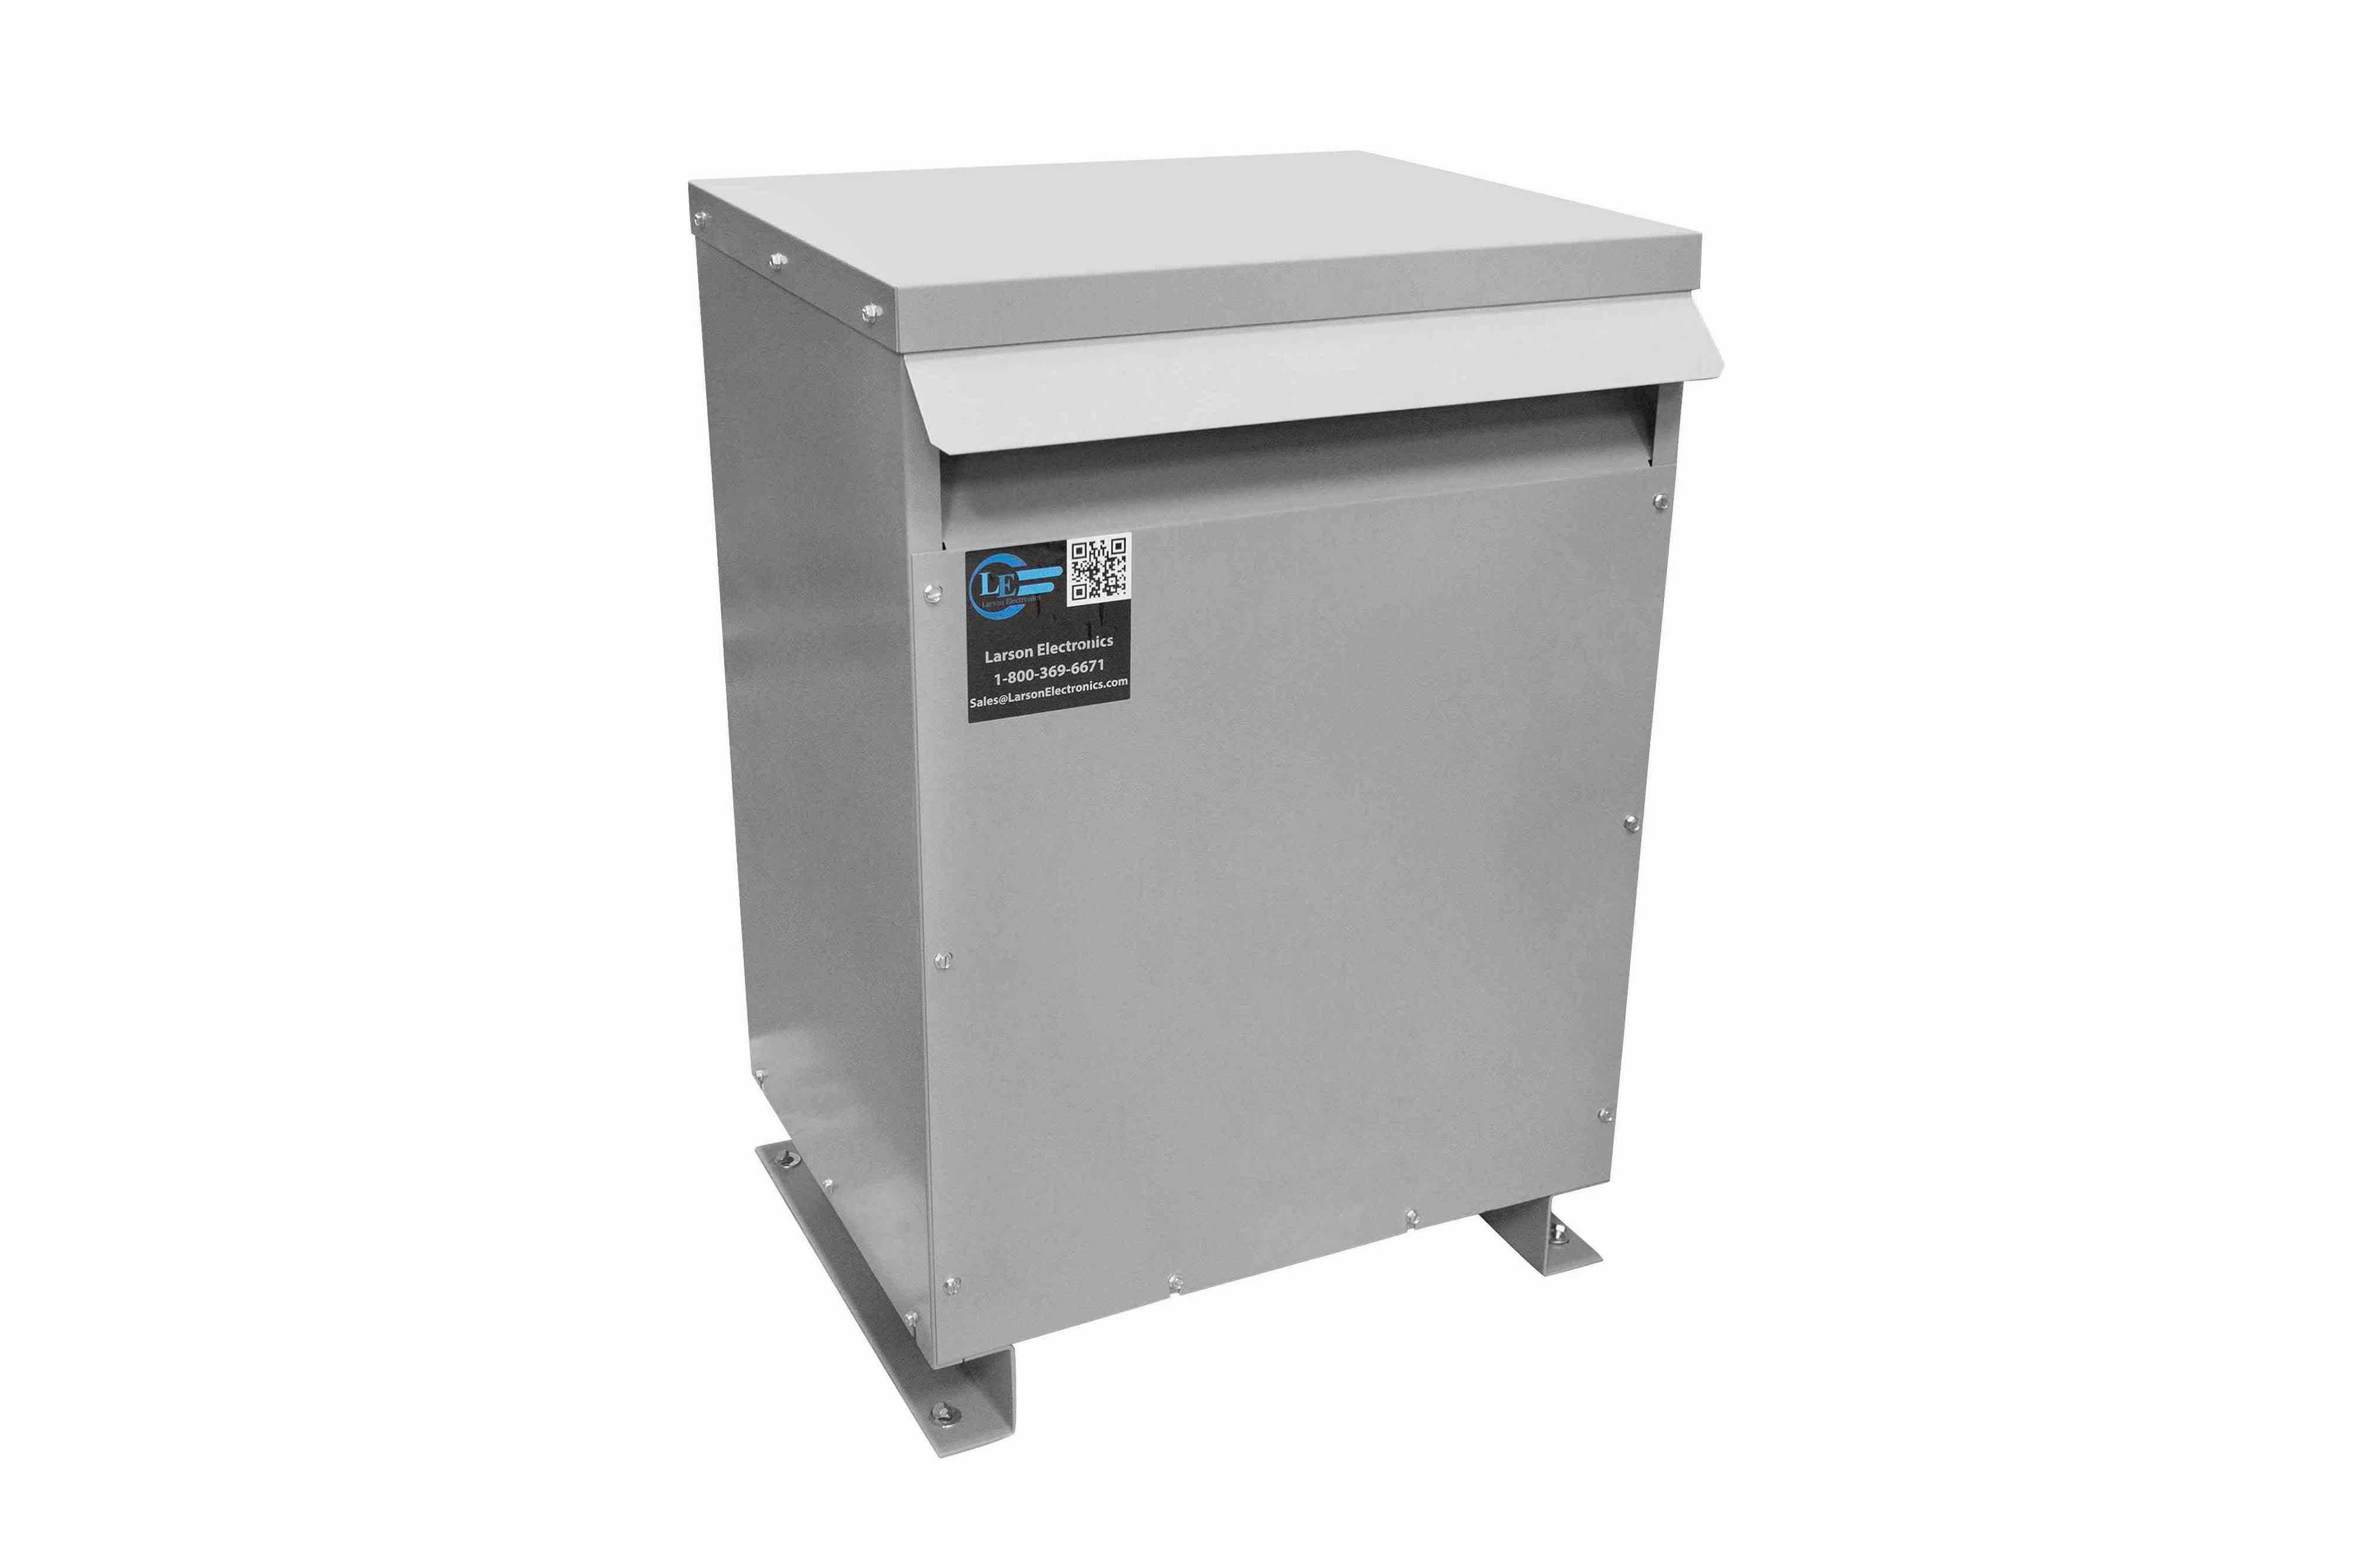 600 kVA 3PH Isolation Transformer, 440V Wye Primary, 208V Delta Secondary, N3R, Ventilated, 60 Hz